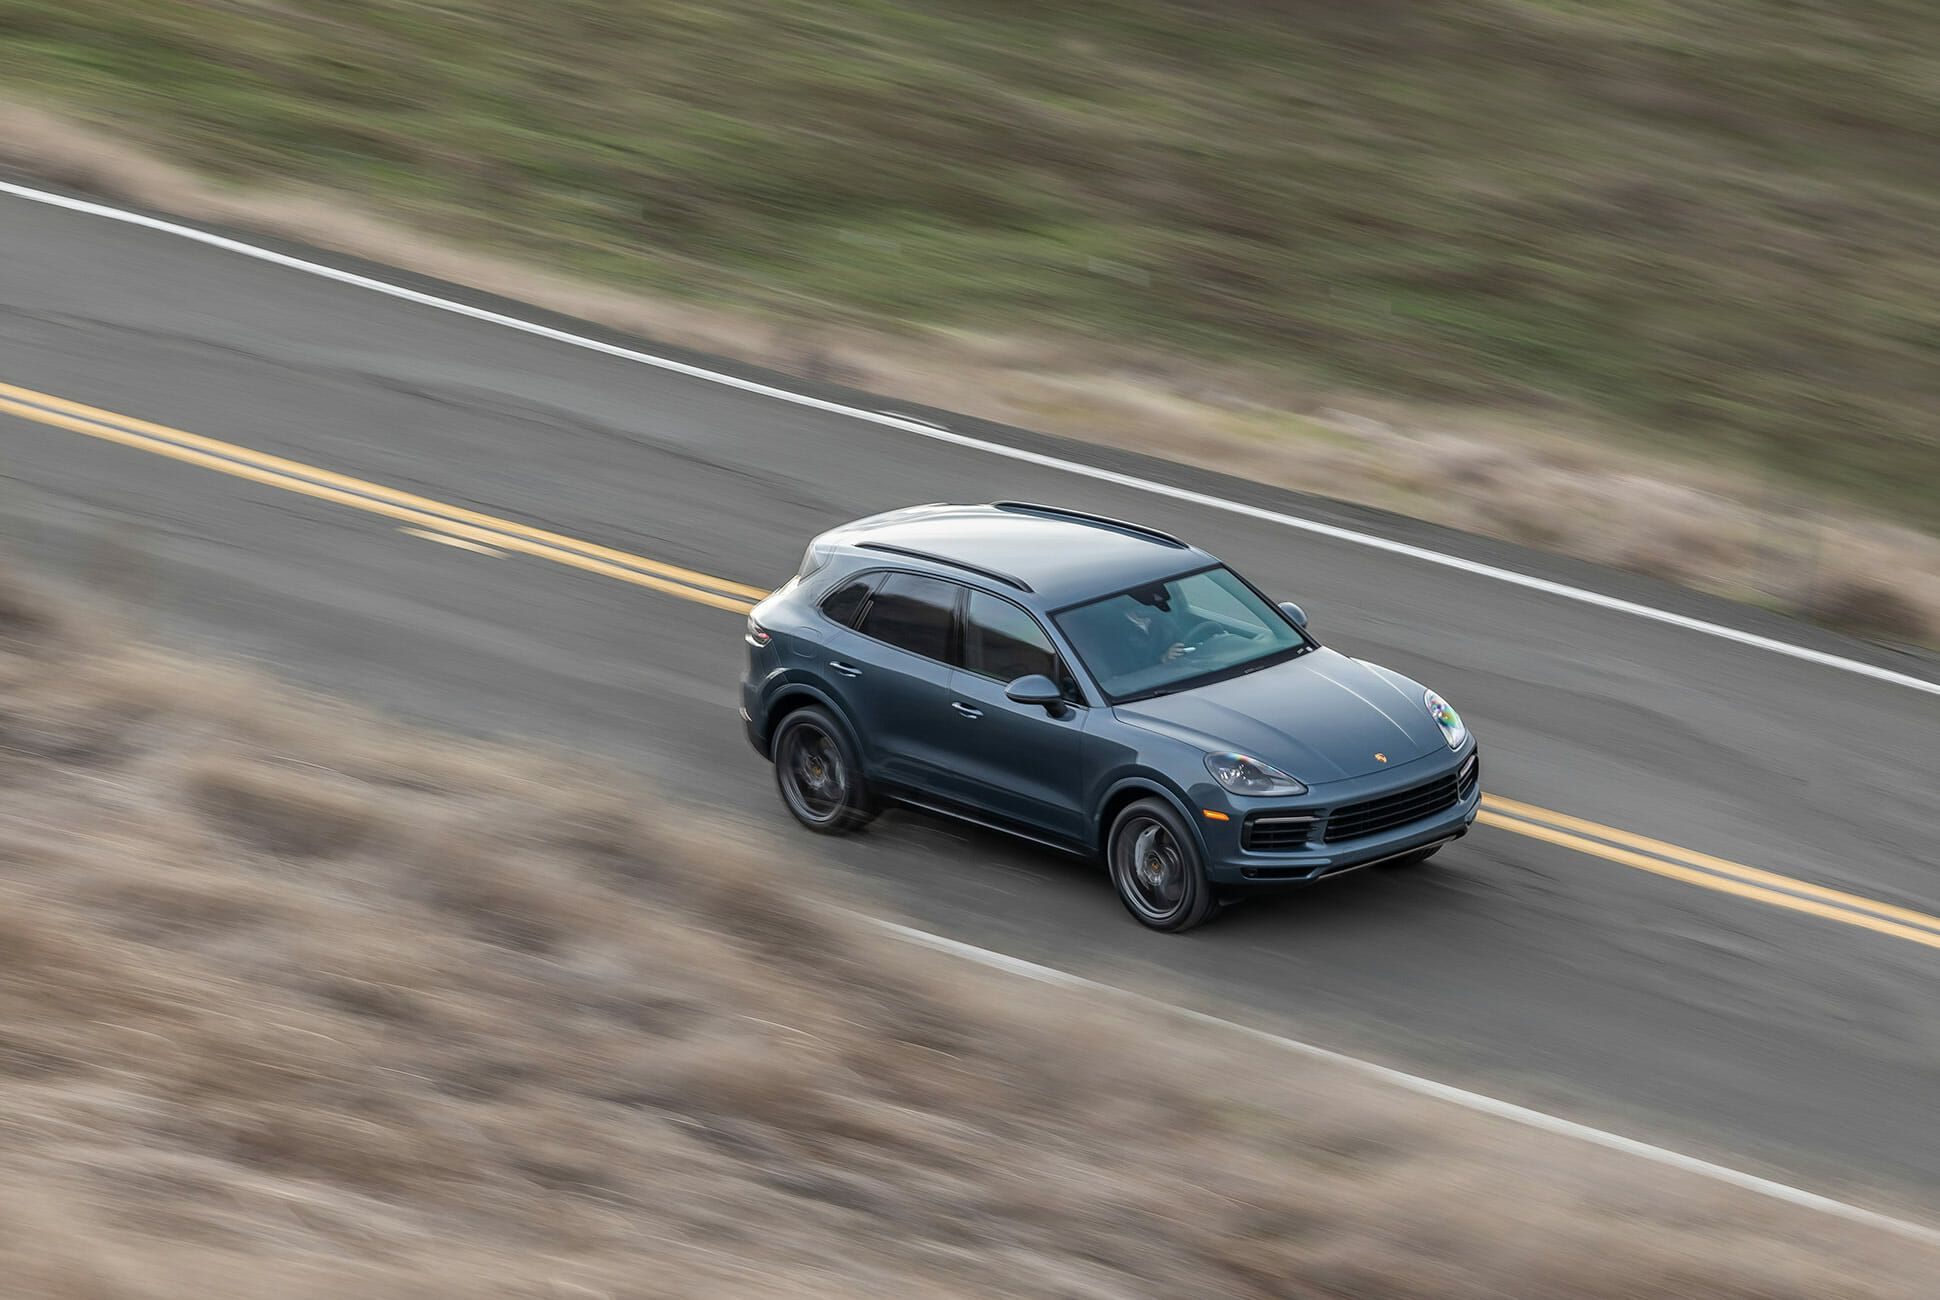 Porsche-Cayenne-Review-gear-patrol-slide-4